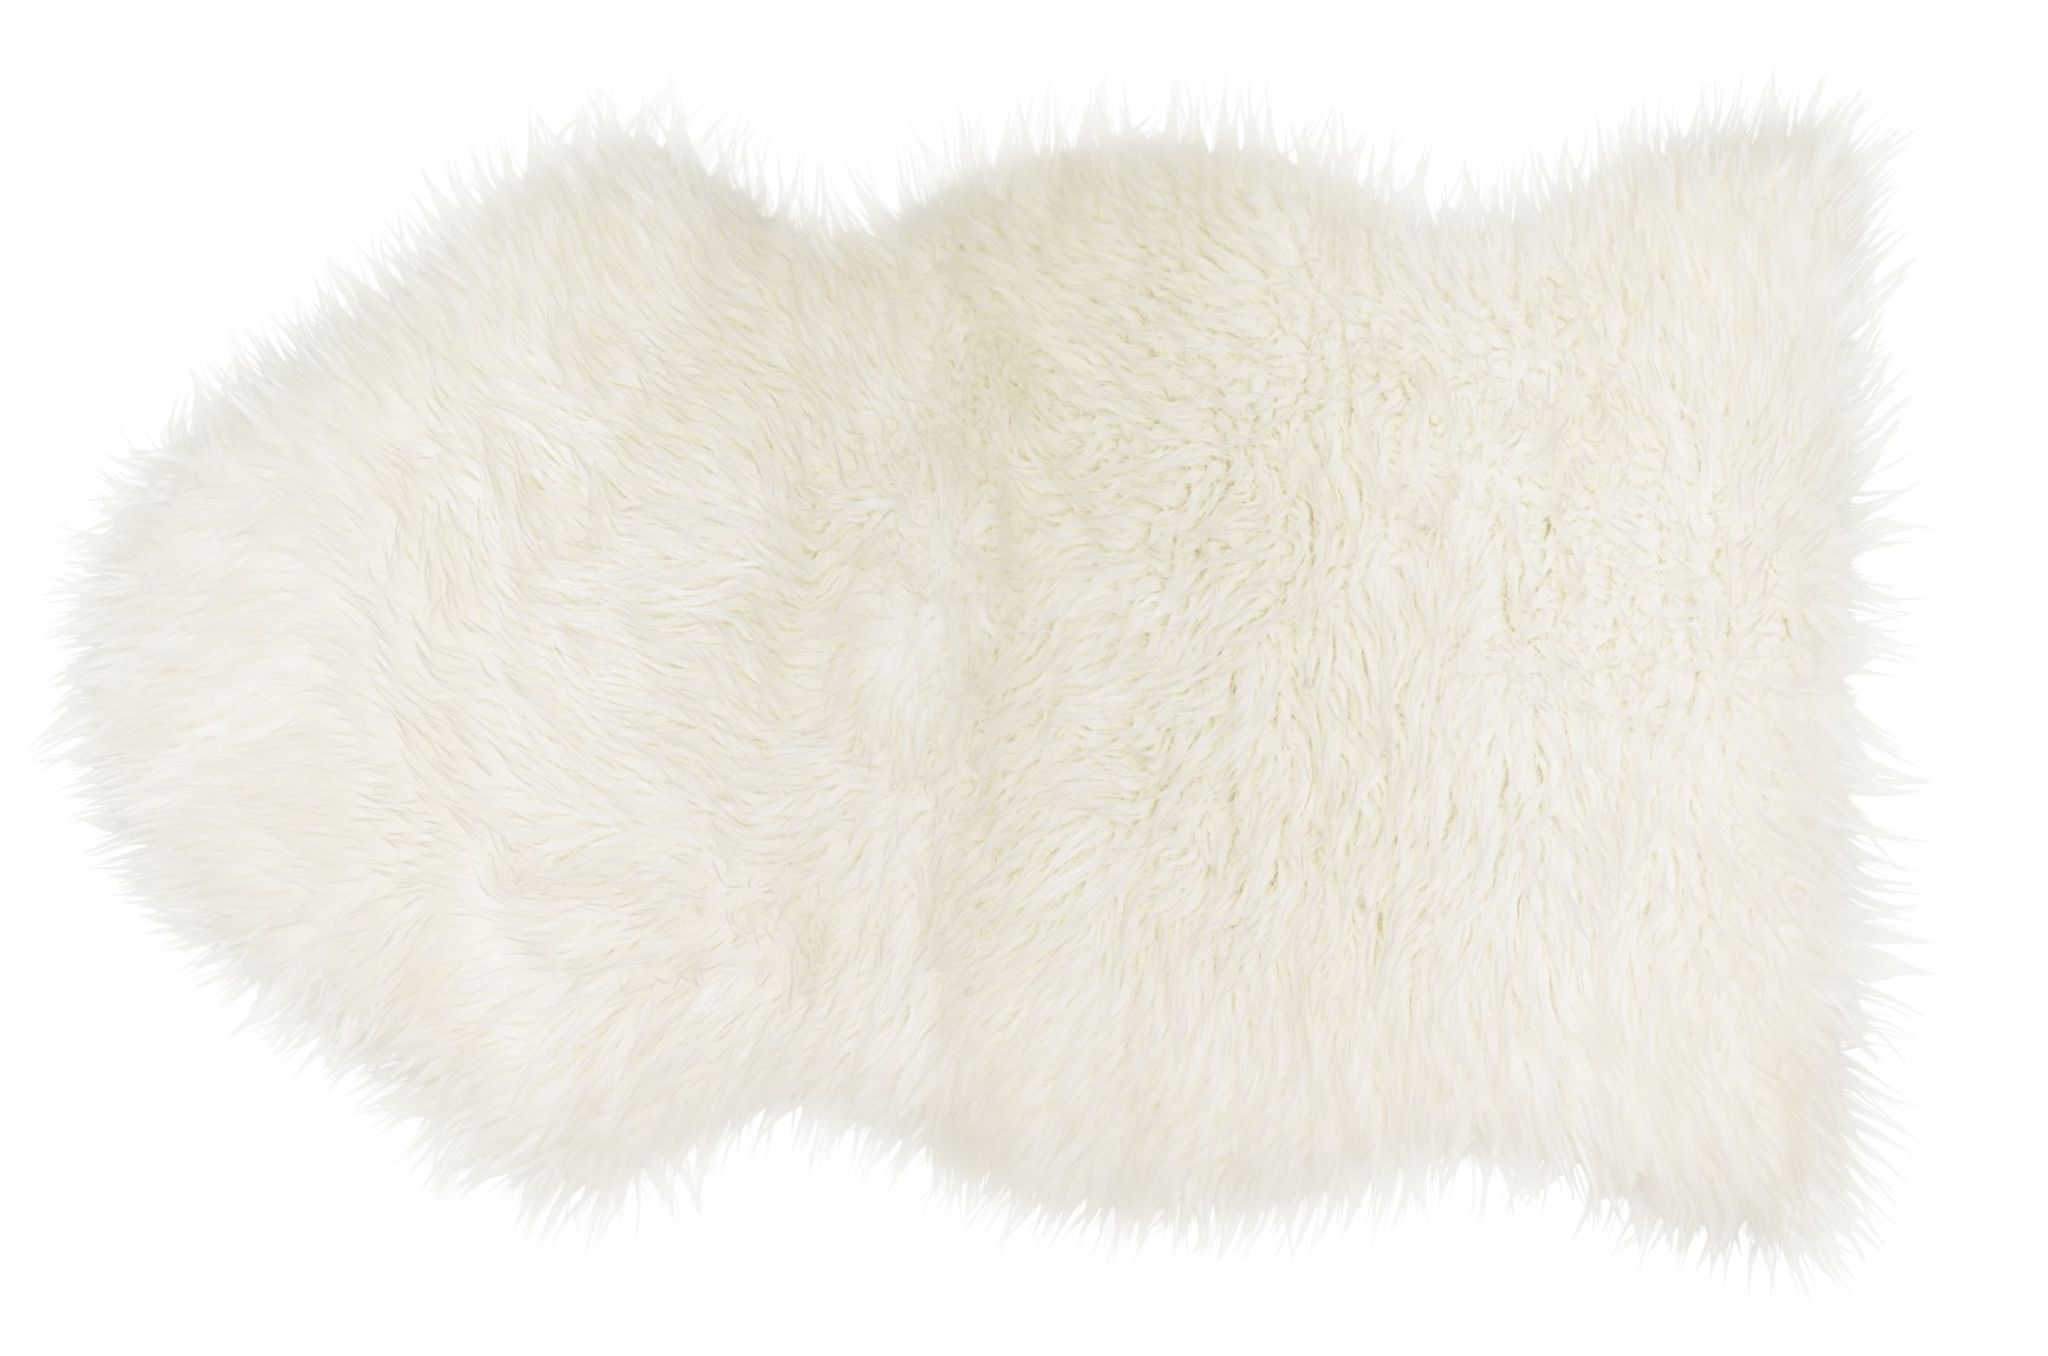 PETA Vegan Homeware Awards 2017 Ikeas 10 fauxsheepskin rug wins